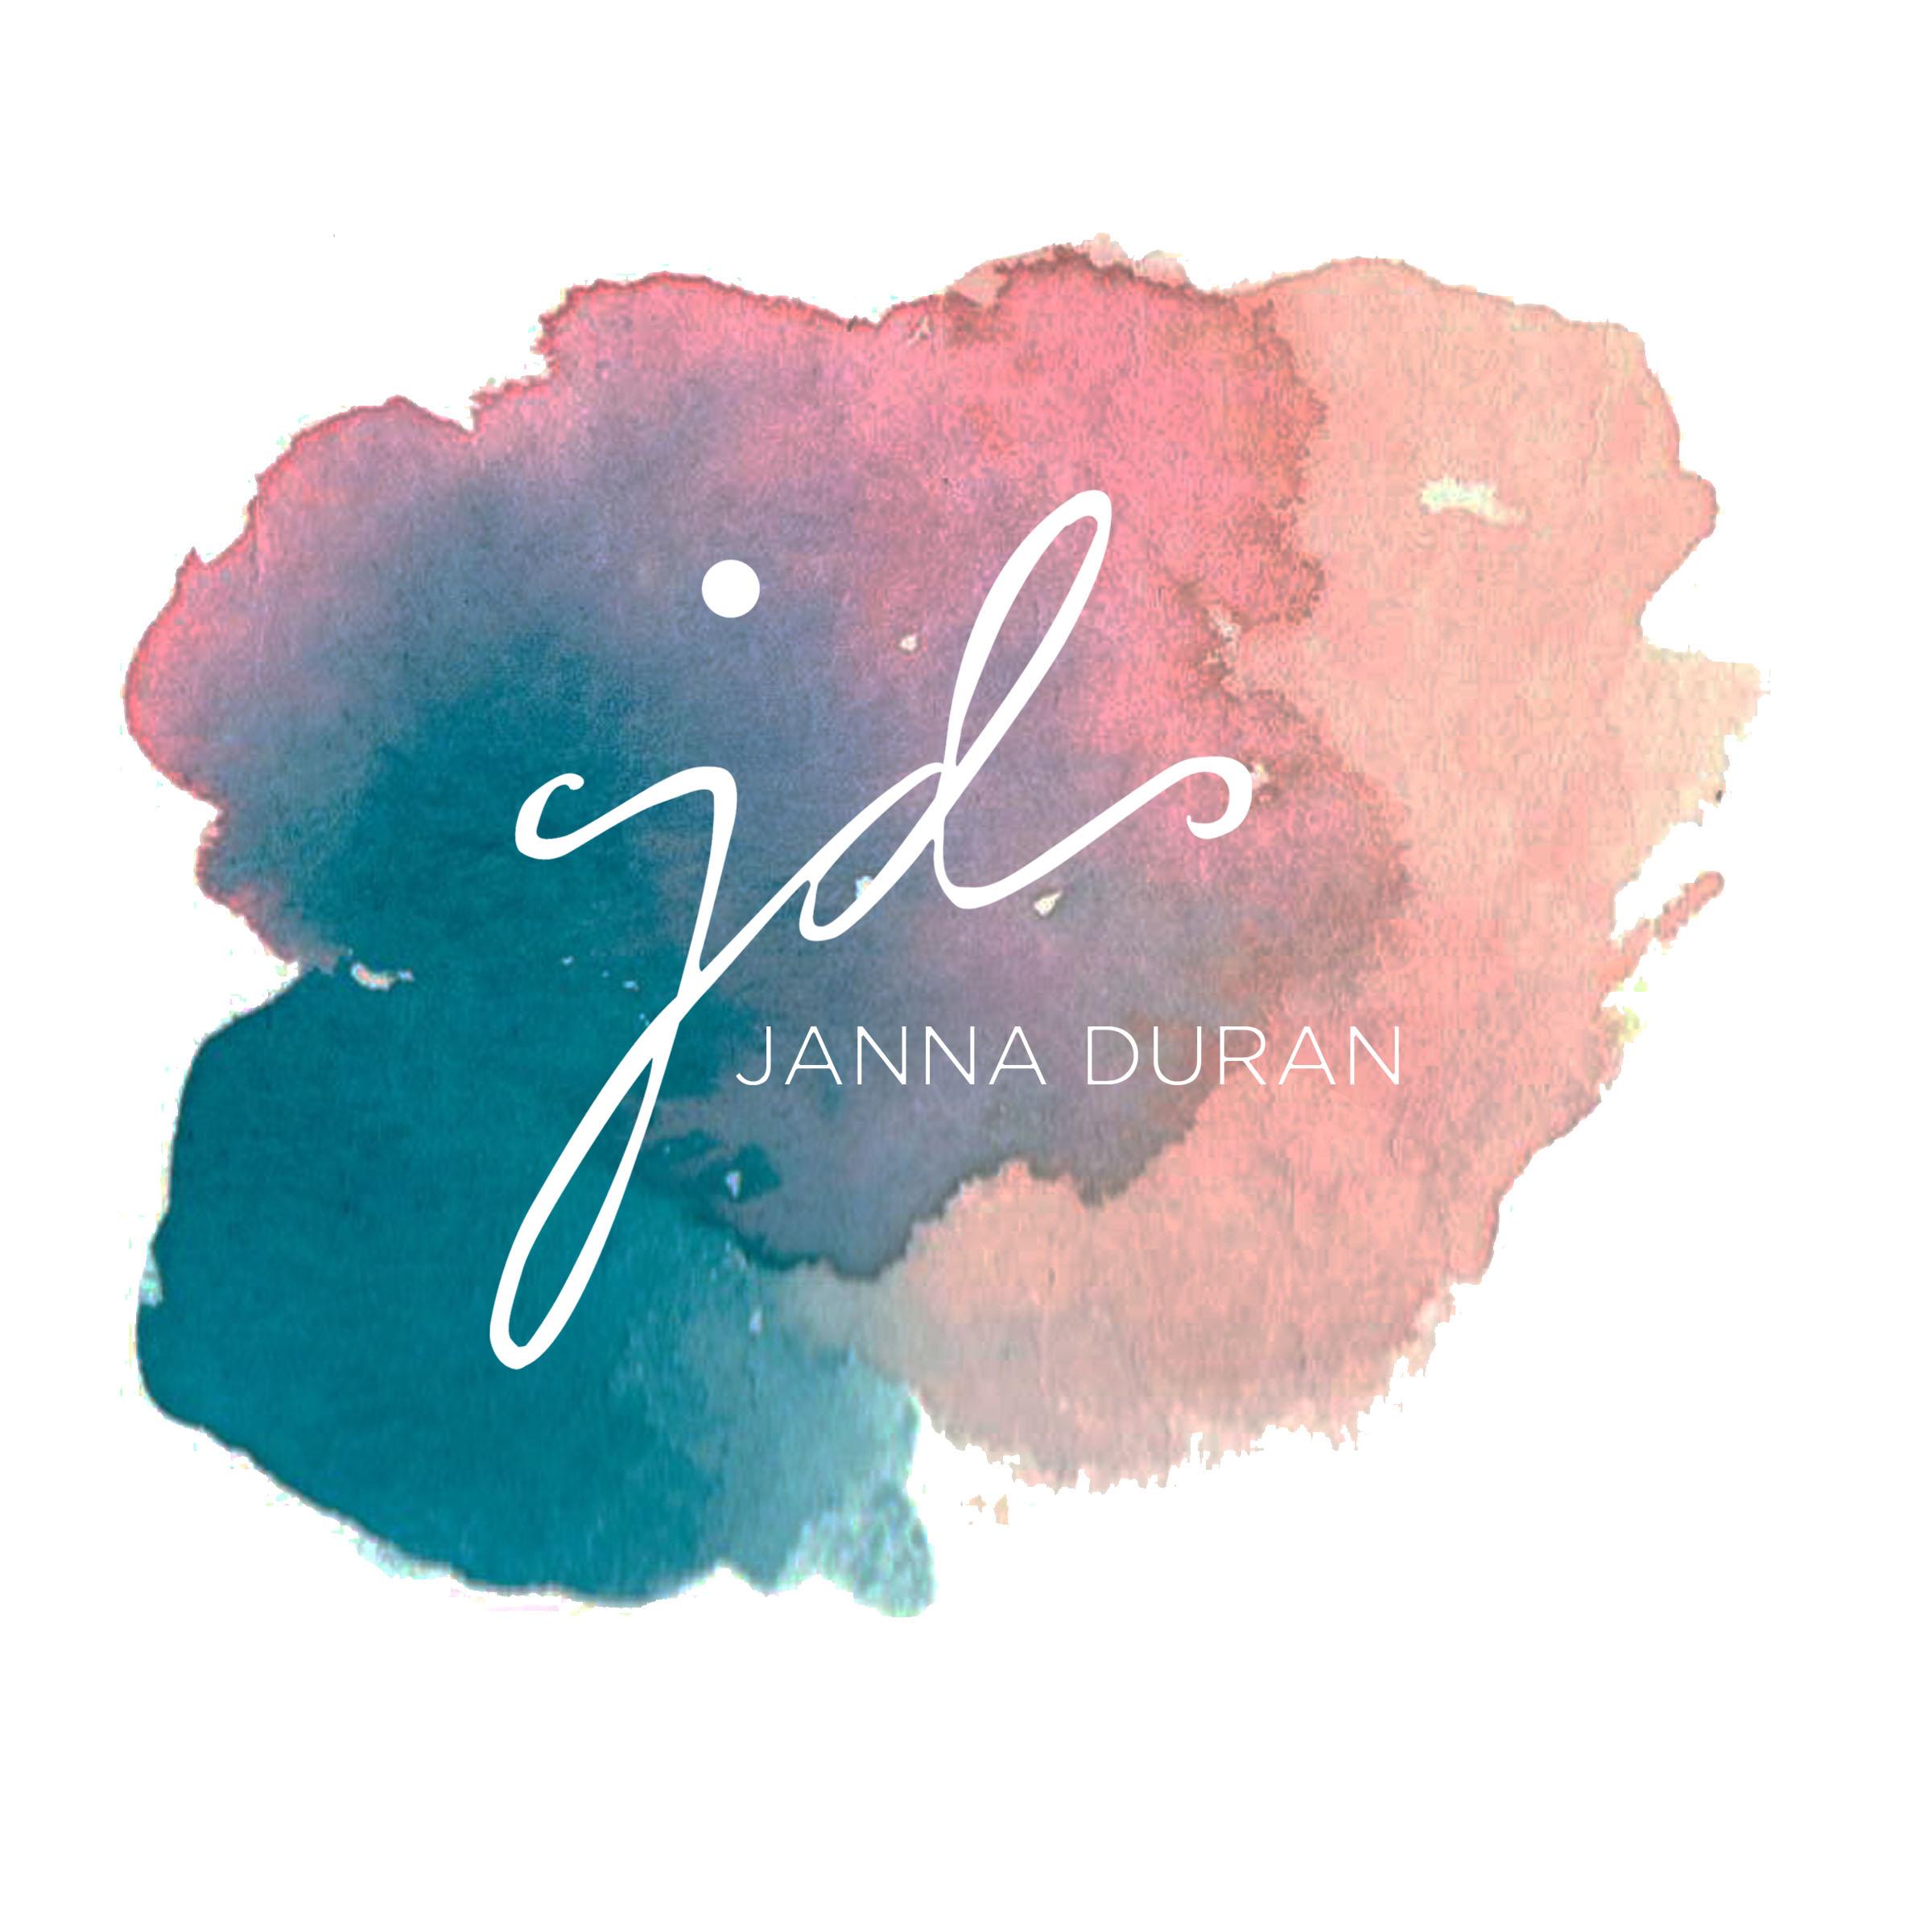 Janna Duran's Signature